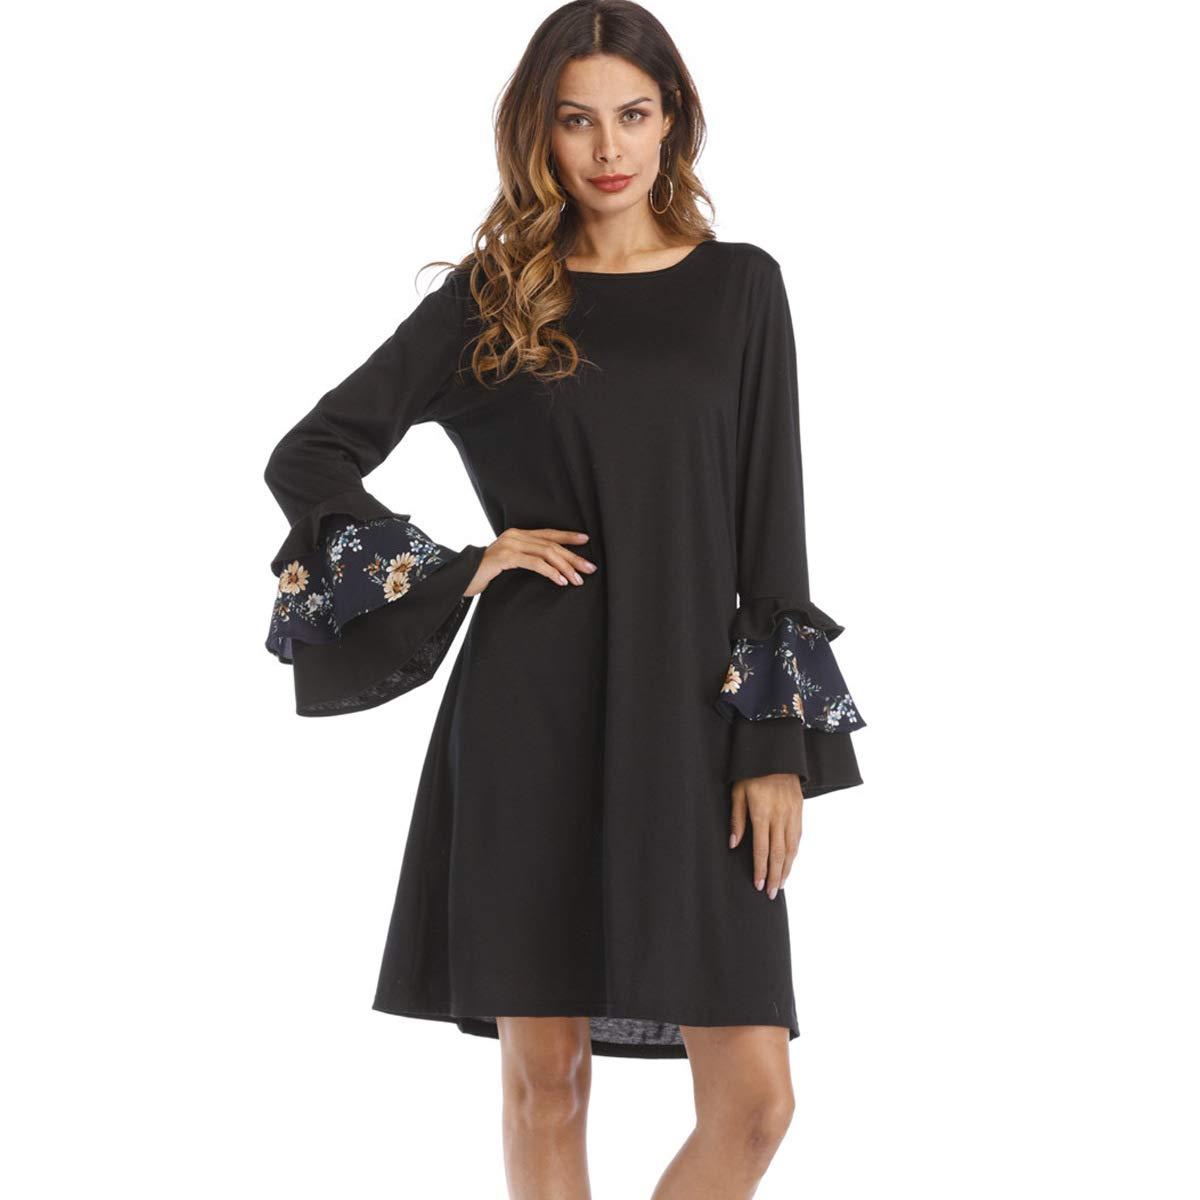 f1a9bc4a683 Amazon.com : Women's Long Sleeve Tunic Dress Swing Shift Dresses T-Shirt  Loose Swing Dress : Sports & Outdoors